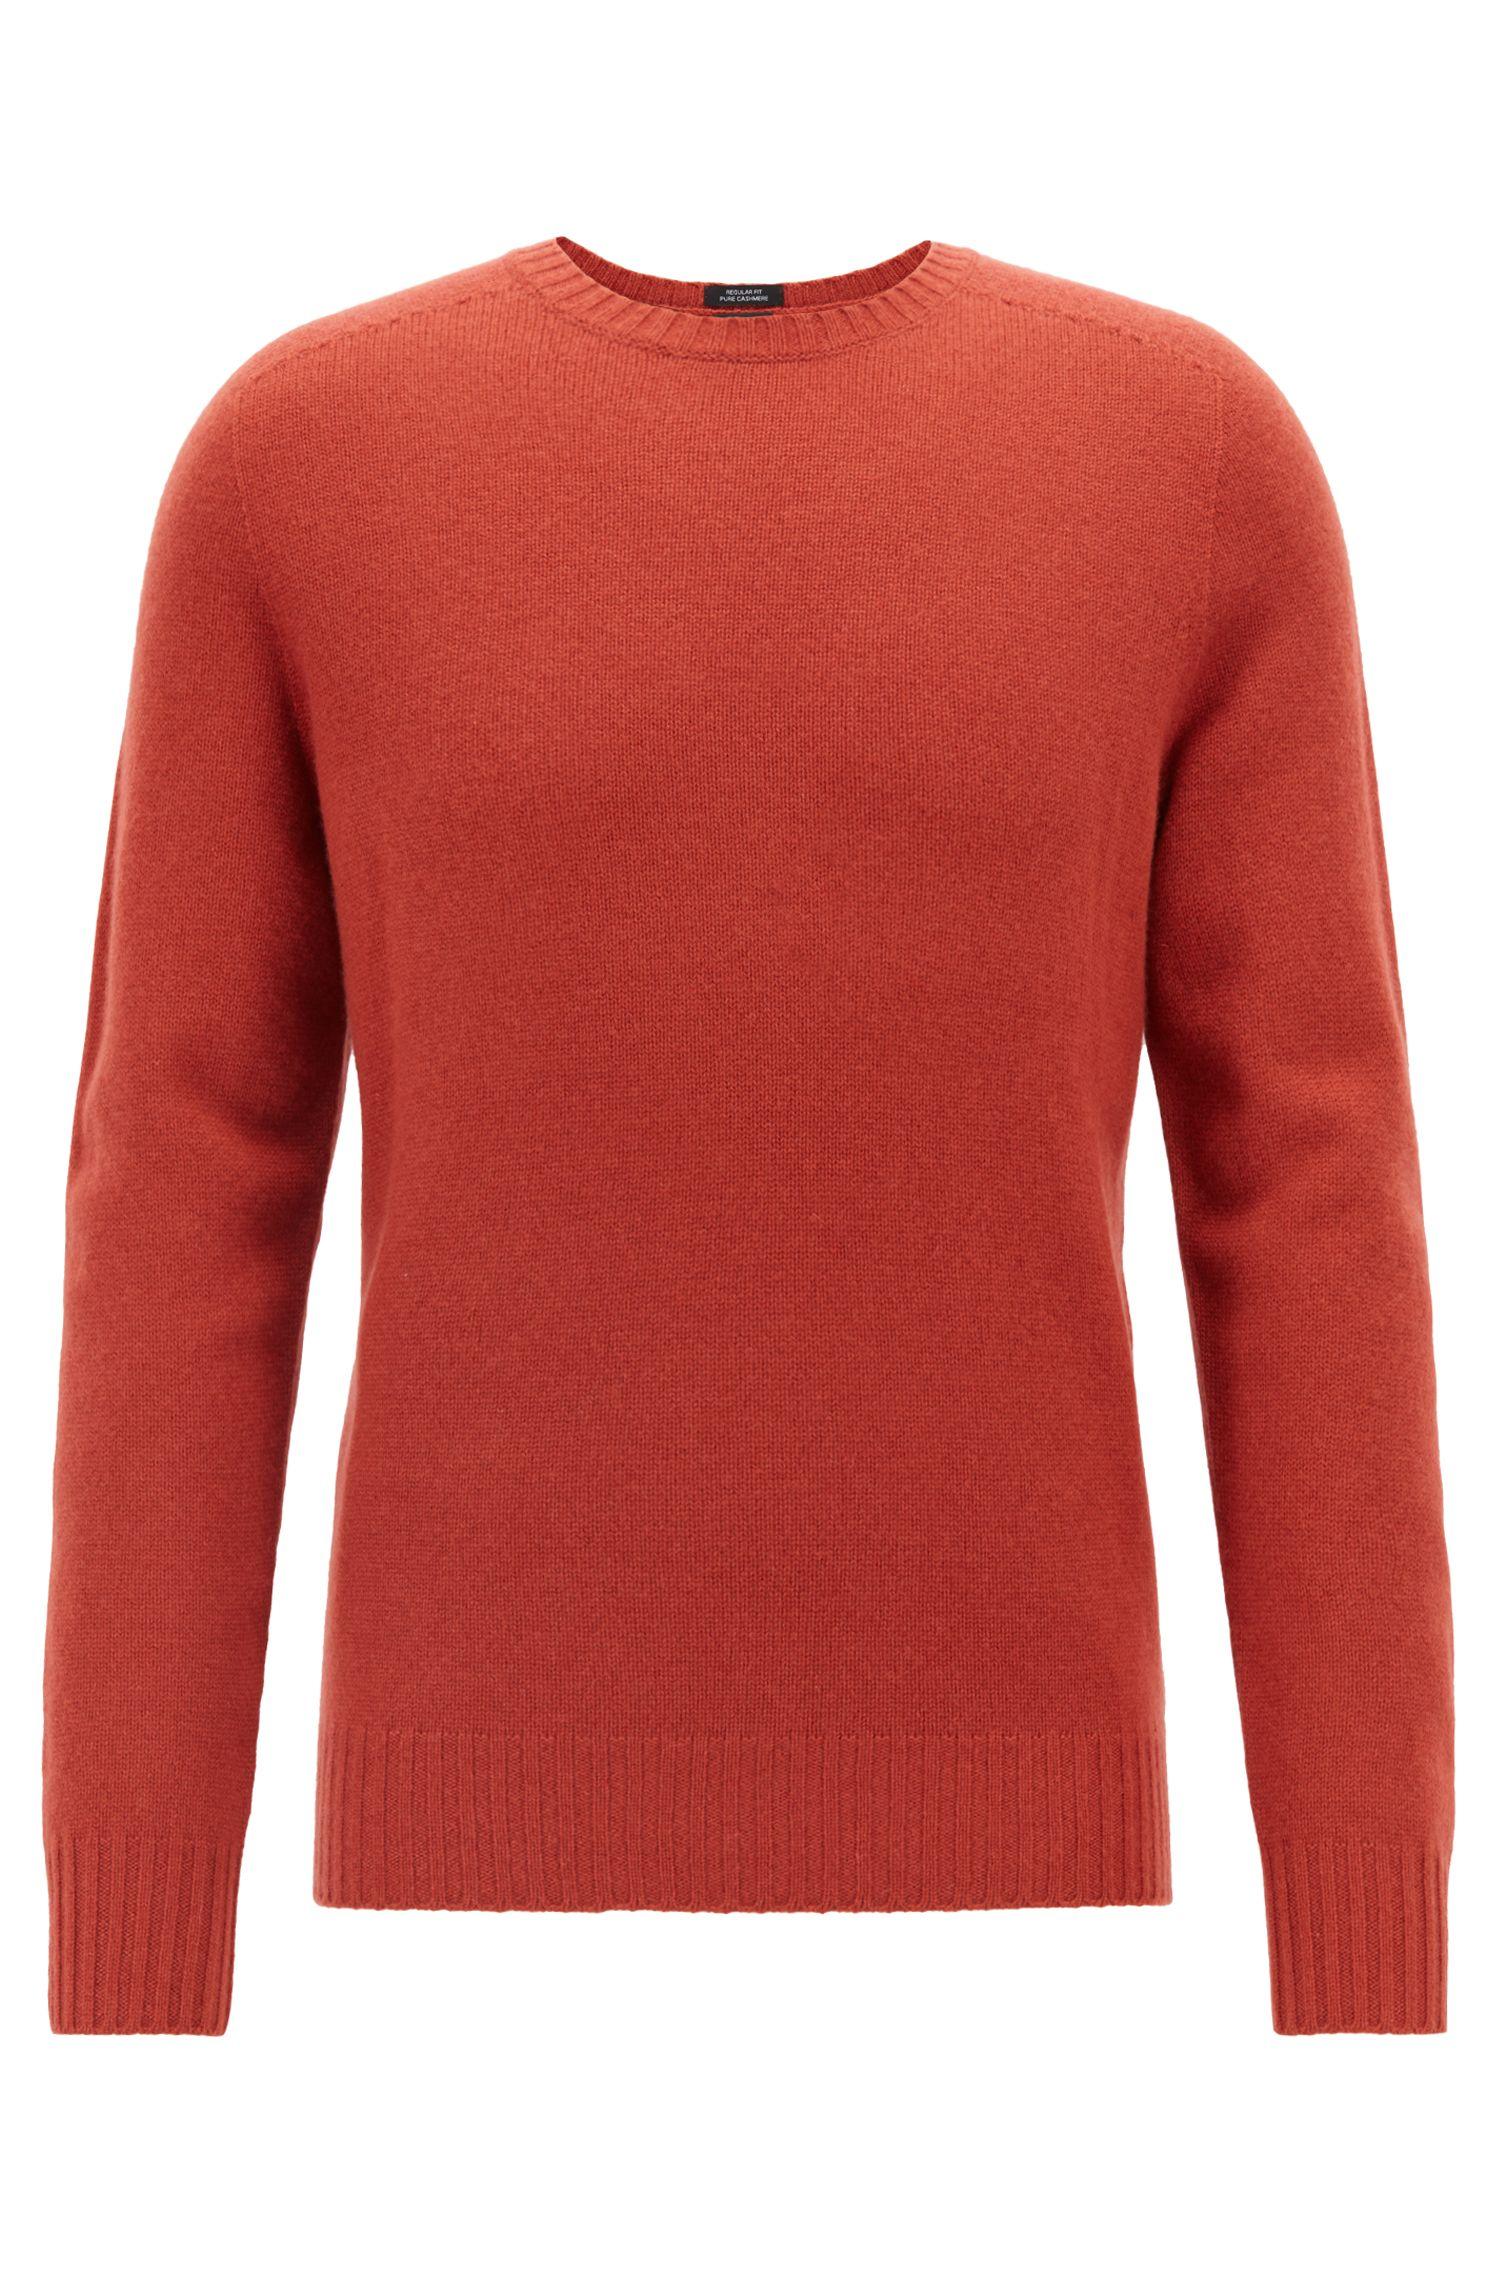 Cashmere sweater with seam-free design, Dark Red